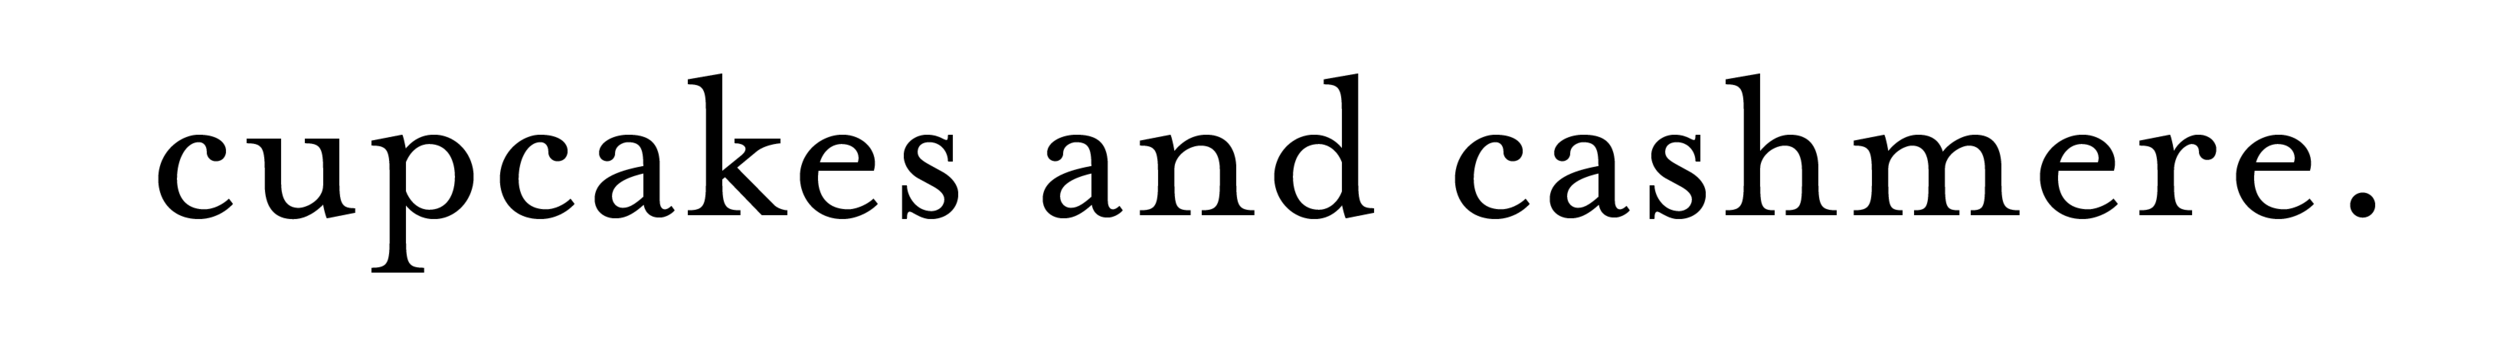 Cupcakes_logo_-_black_3264x.png